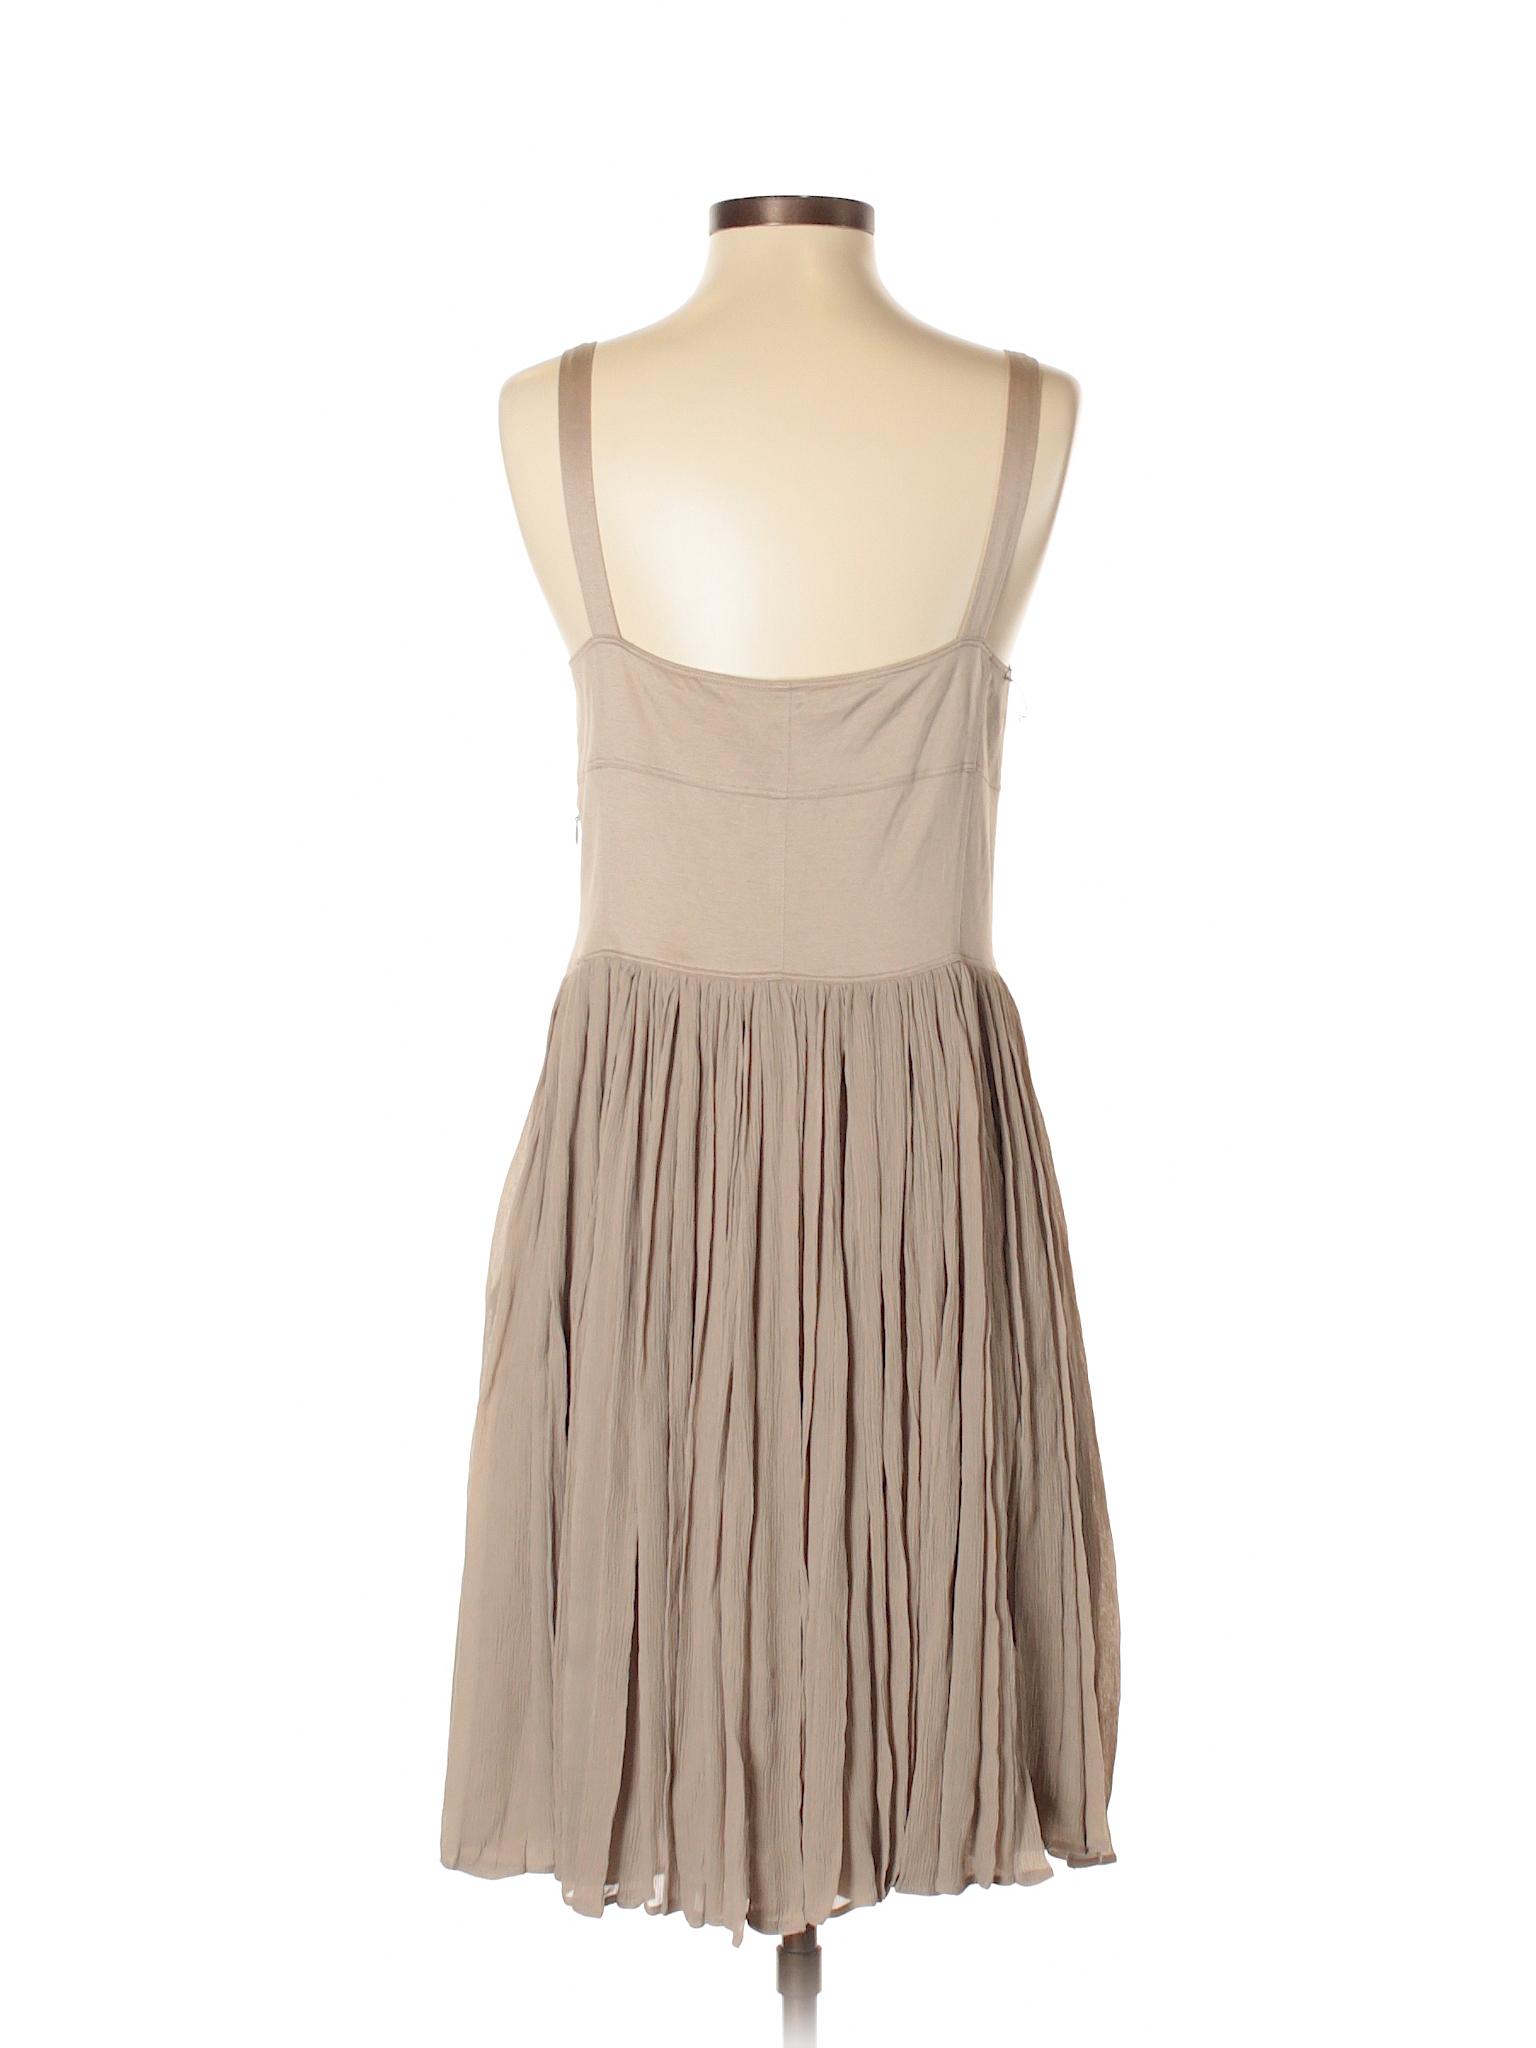 winter Casual Boutique Dress Burberry winter Boutique qwxggU1pB